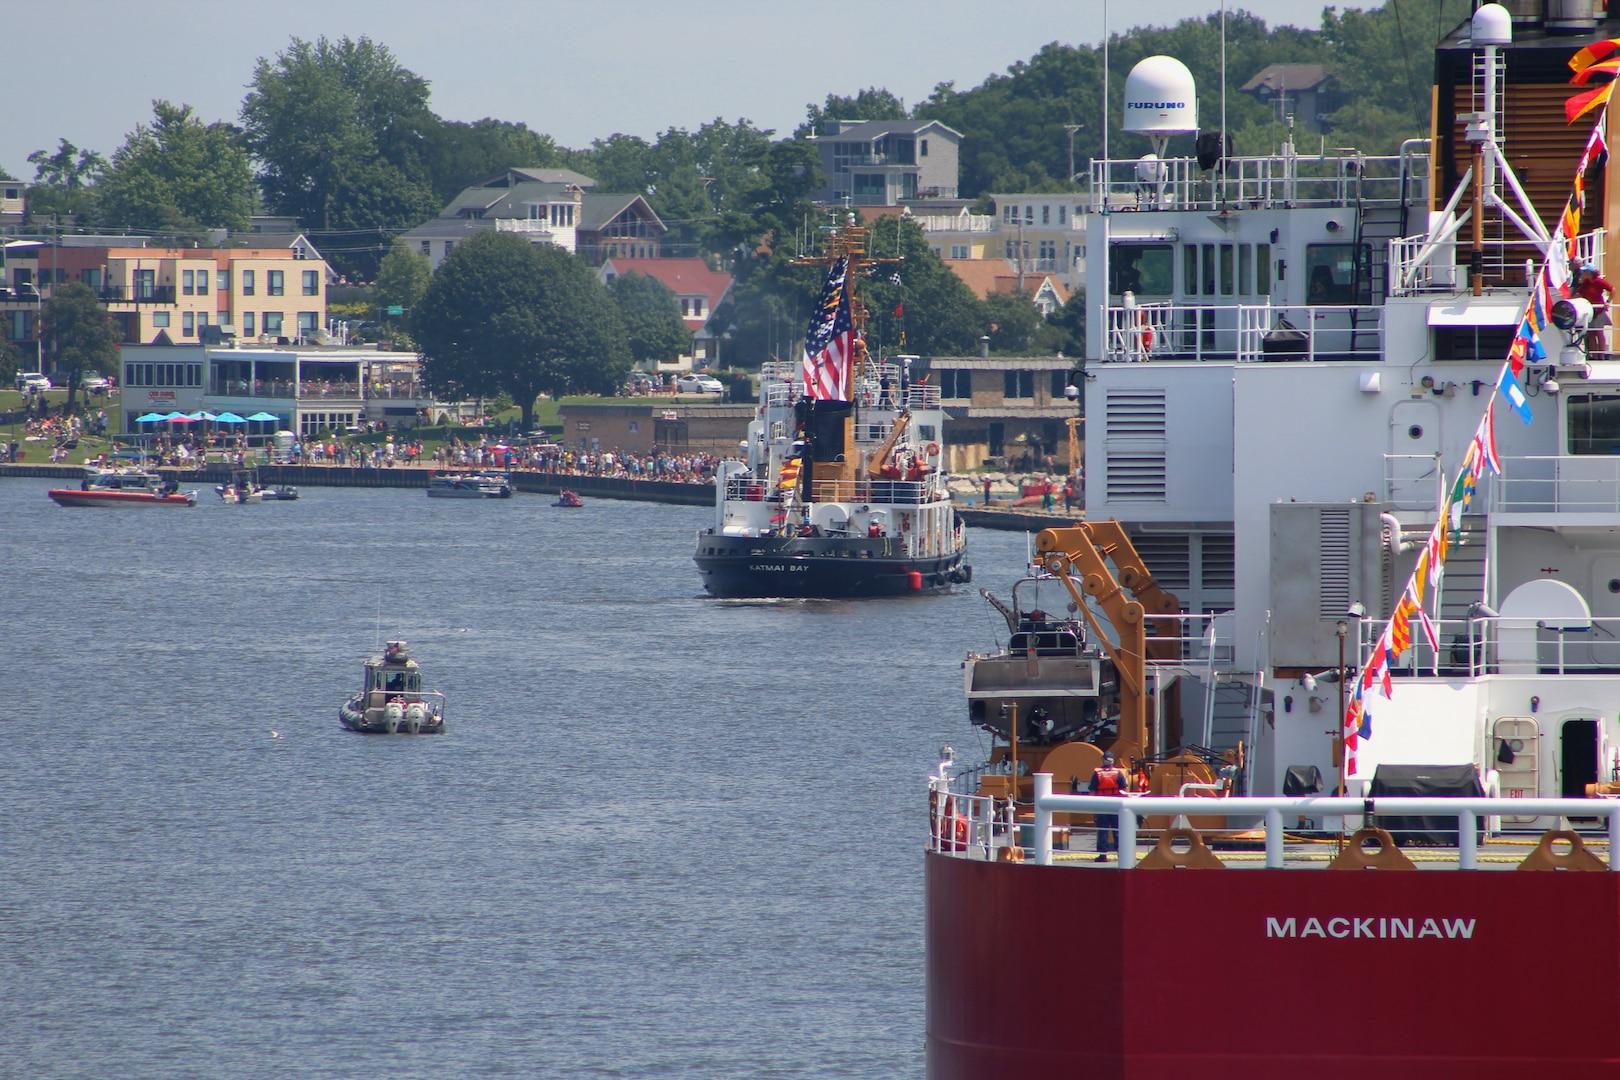 U.S. Coast Guard Cutter Mackinaw follows the Cutter Katmai Bay up the Grand Haven Channel during the Parade of Ships at the Grand Haven Coast Guard Festival in Grand Haven, Michigan, Aug. 2, 2021. (Coast Guard photo)